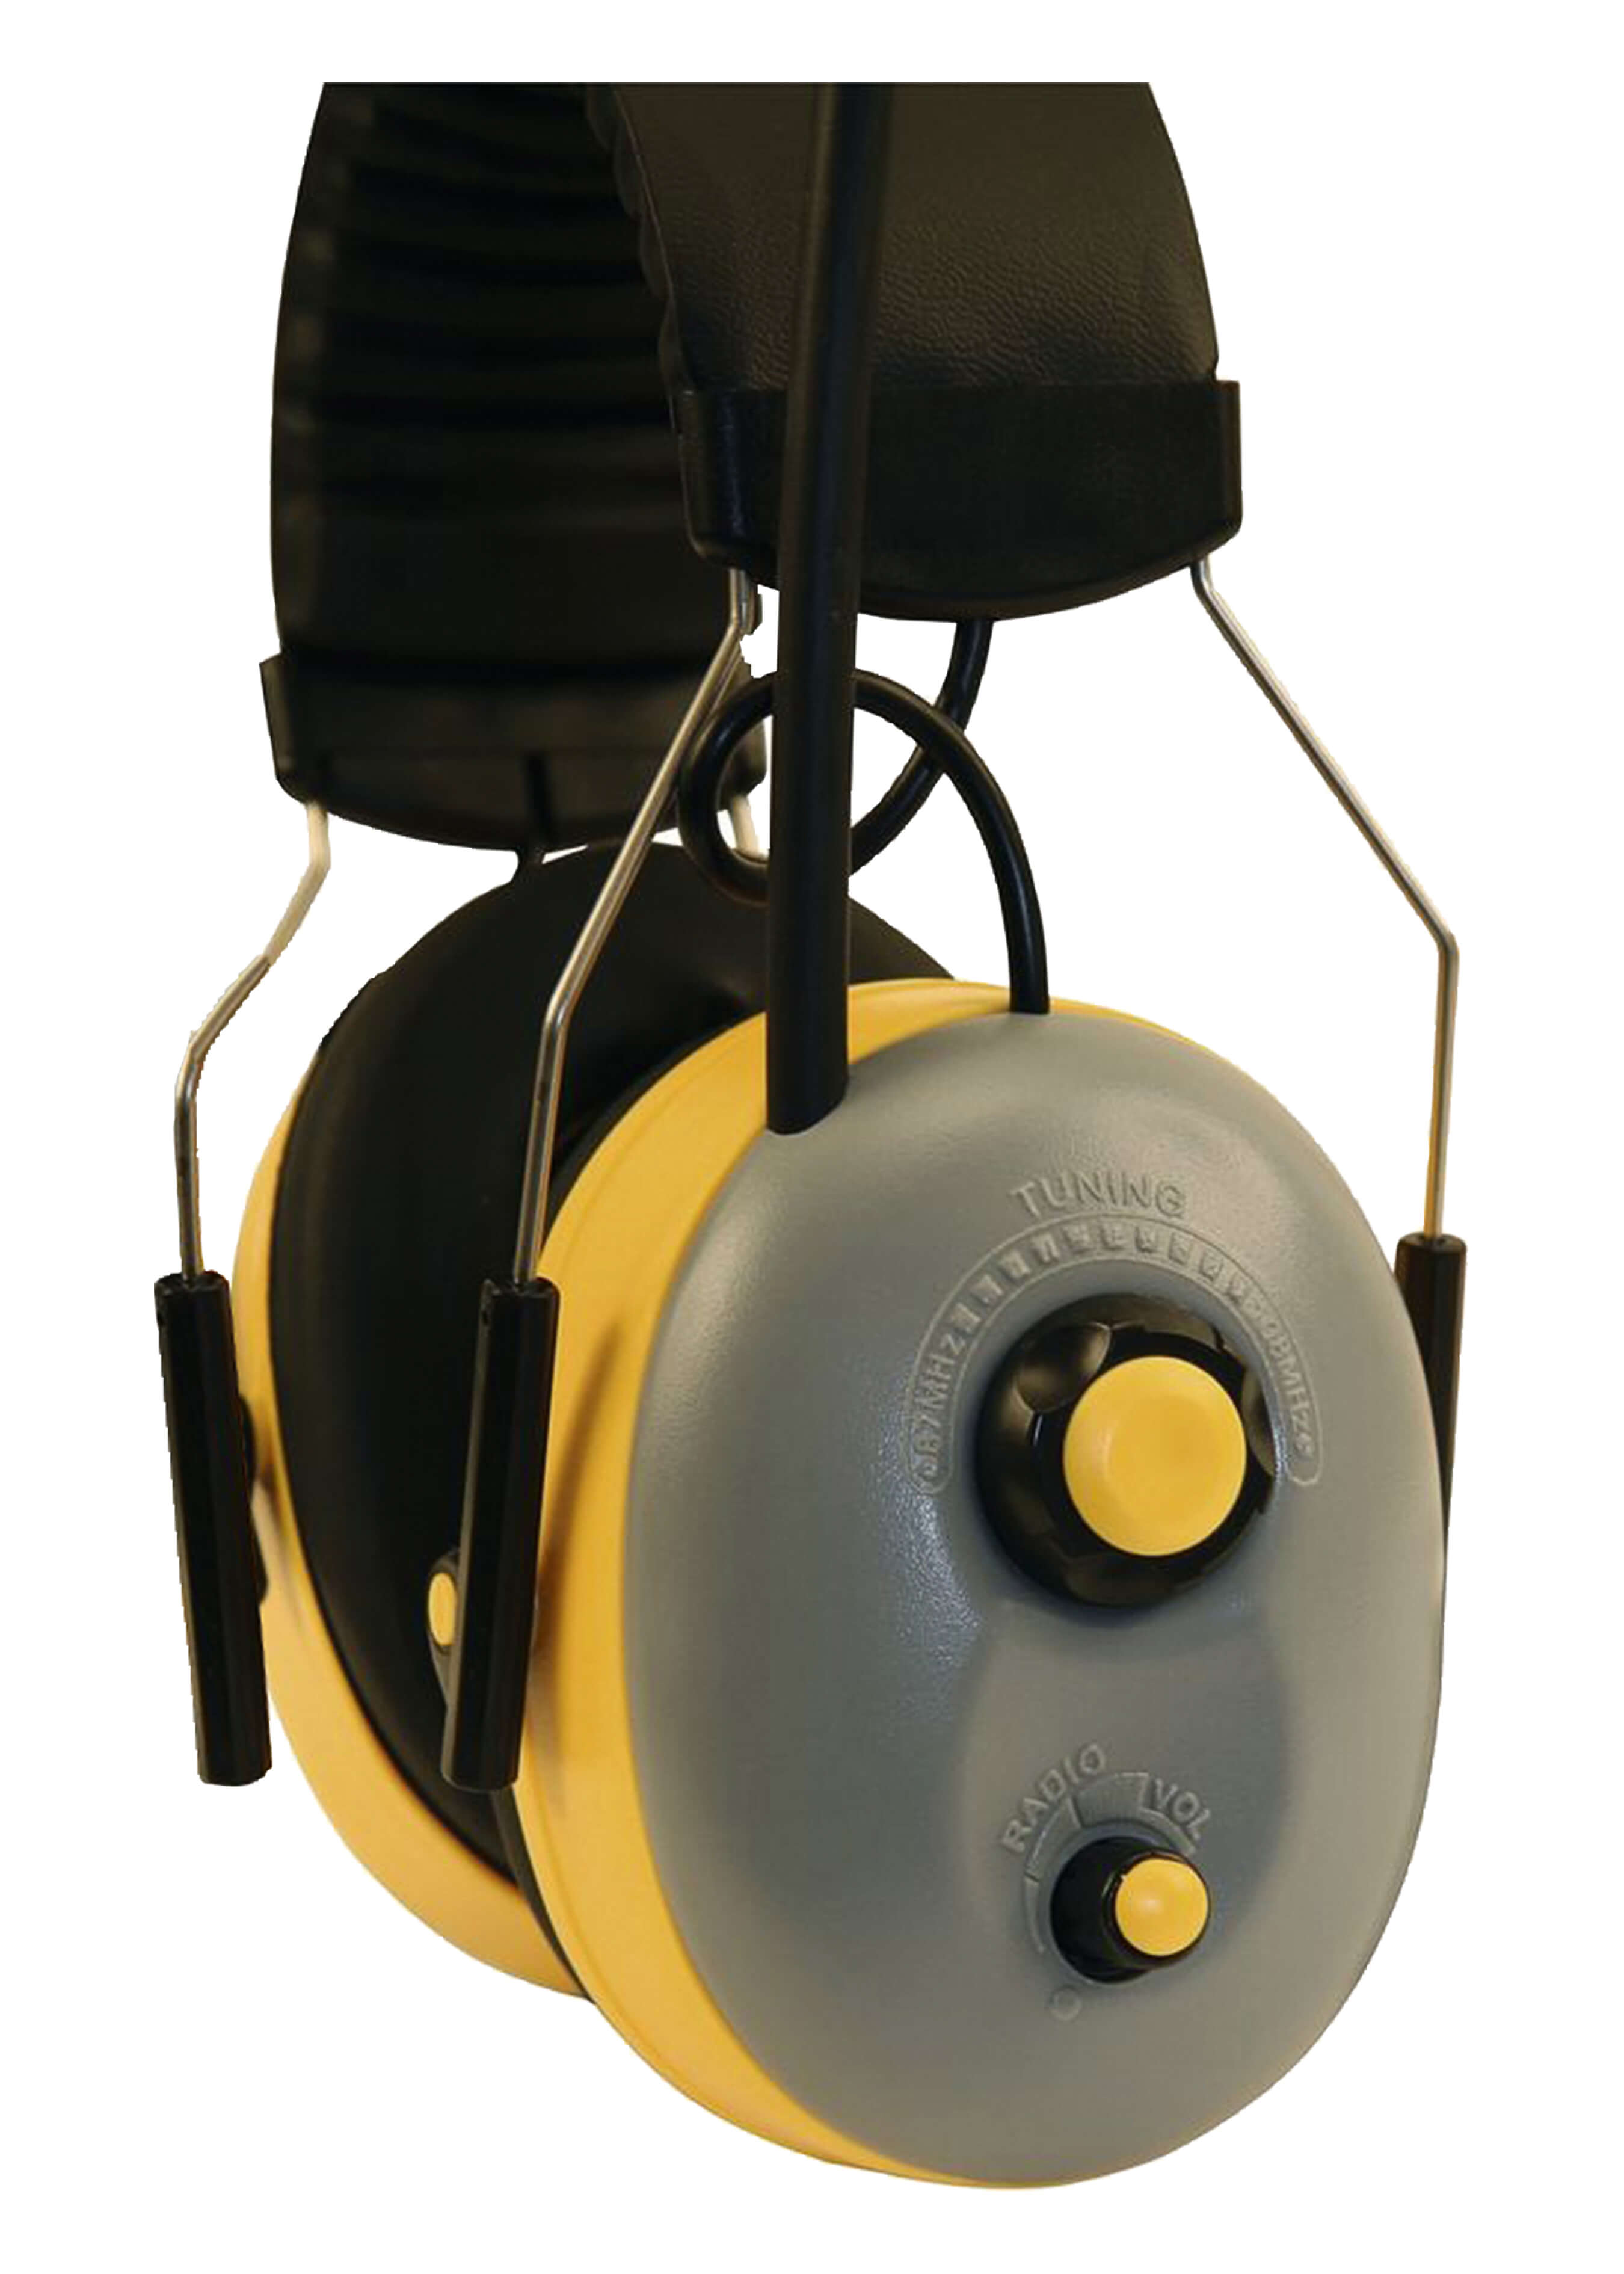 Gehörschutz mit Stereo-Radio 275001 2